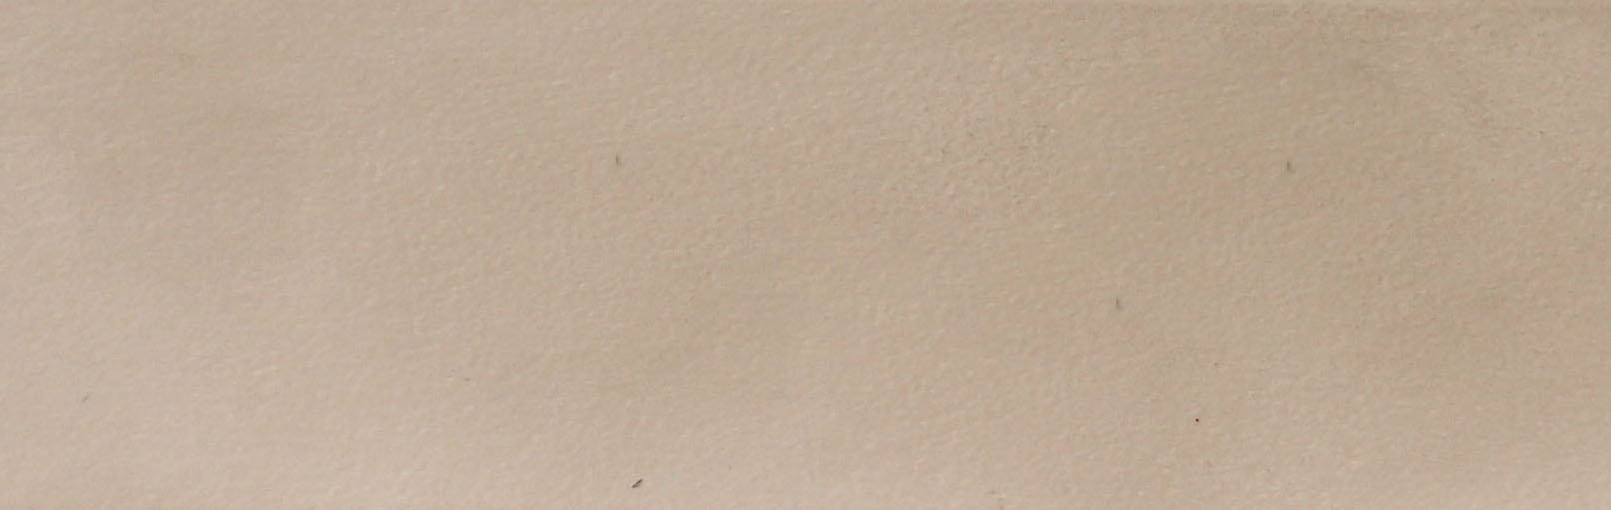 1A68 - GRIS CLARO  23 x 1 mm